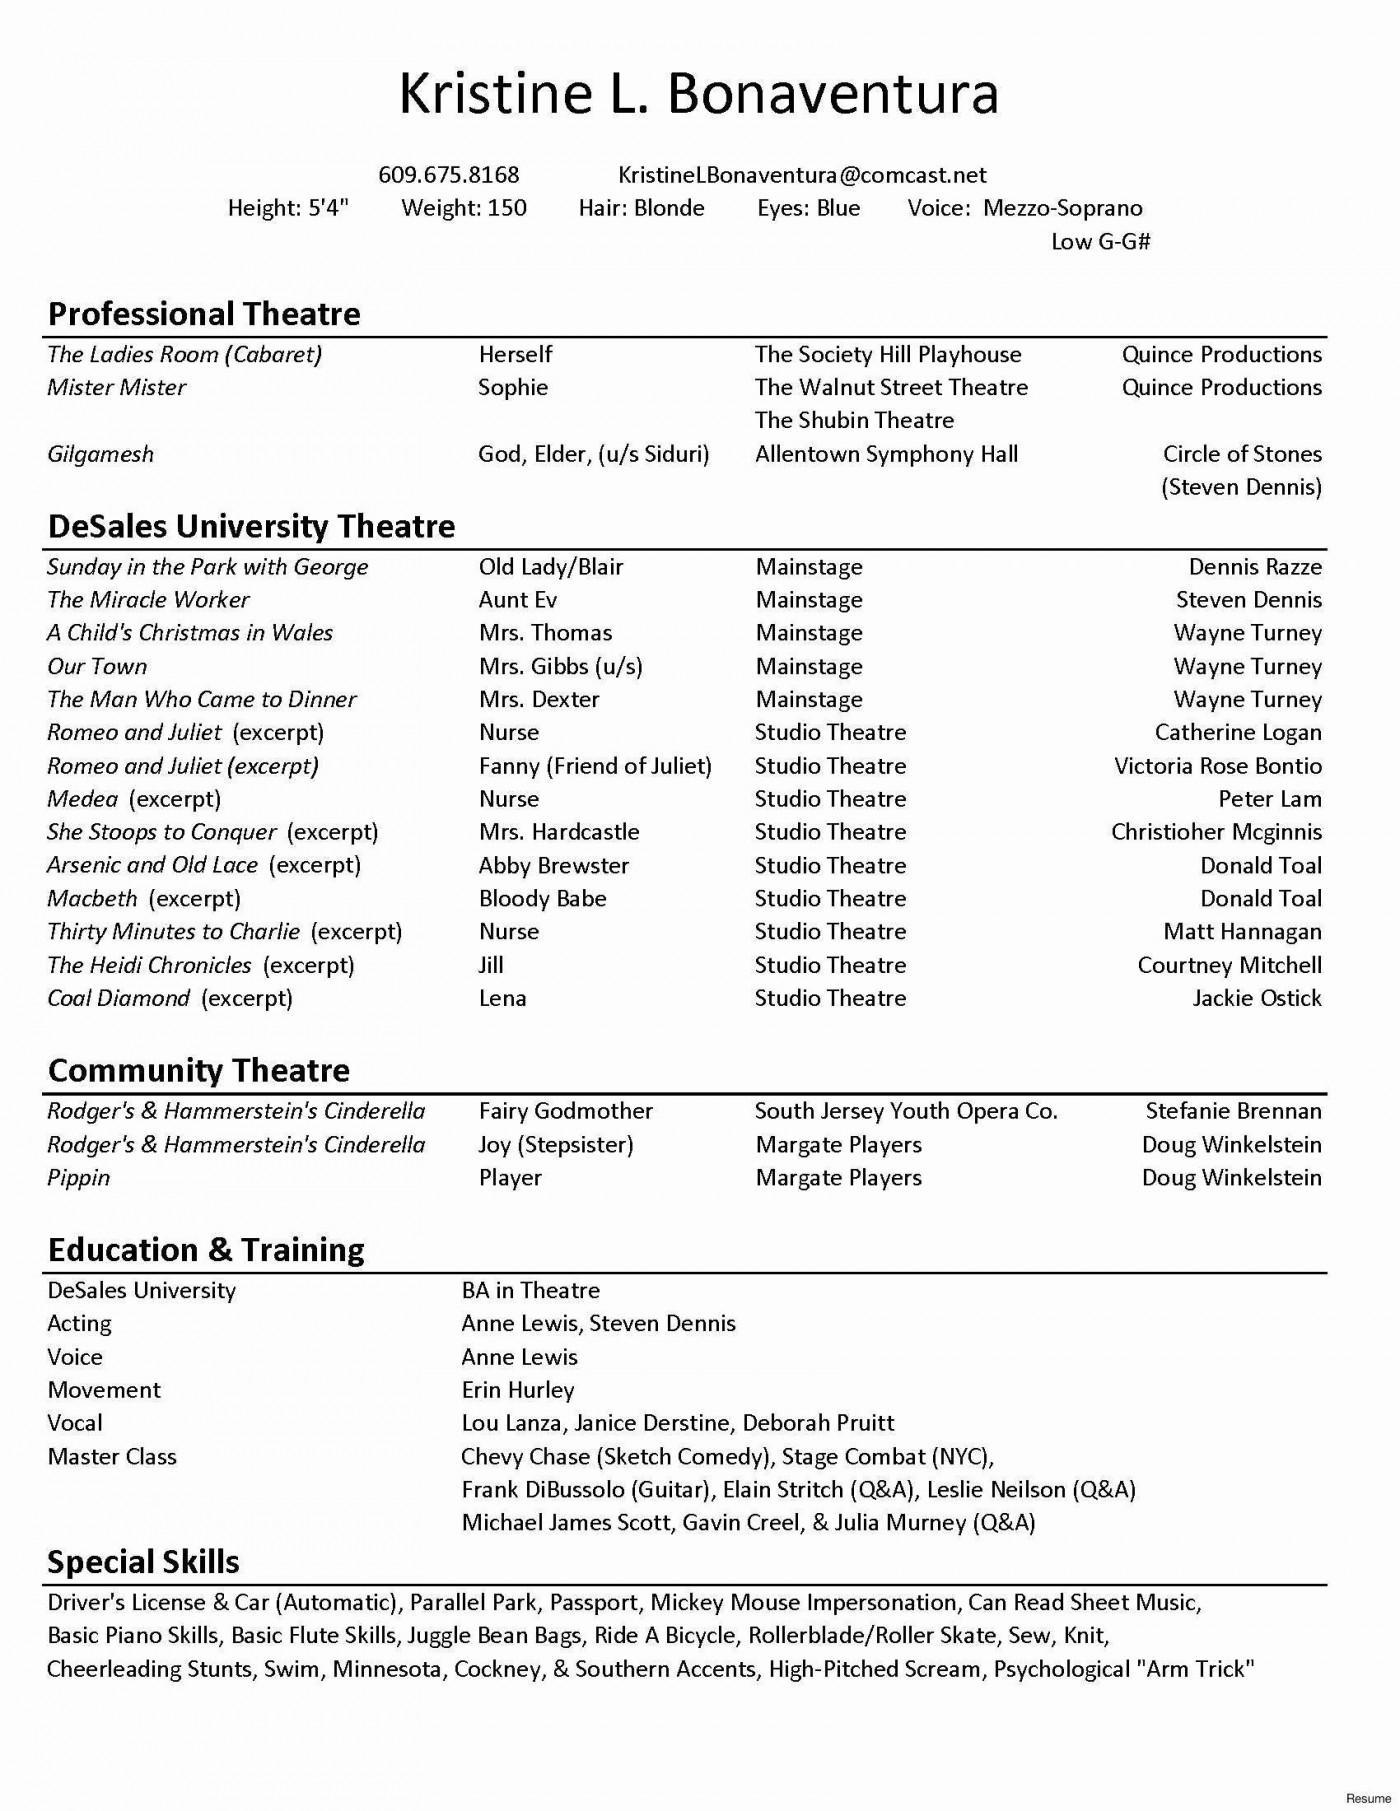 005 Sensational Technical Theatre Resume Template Concept  Google Doc Tech1400